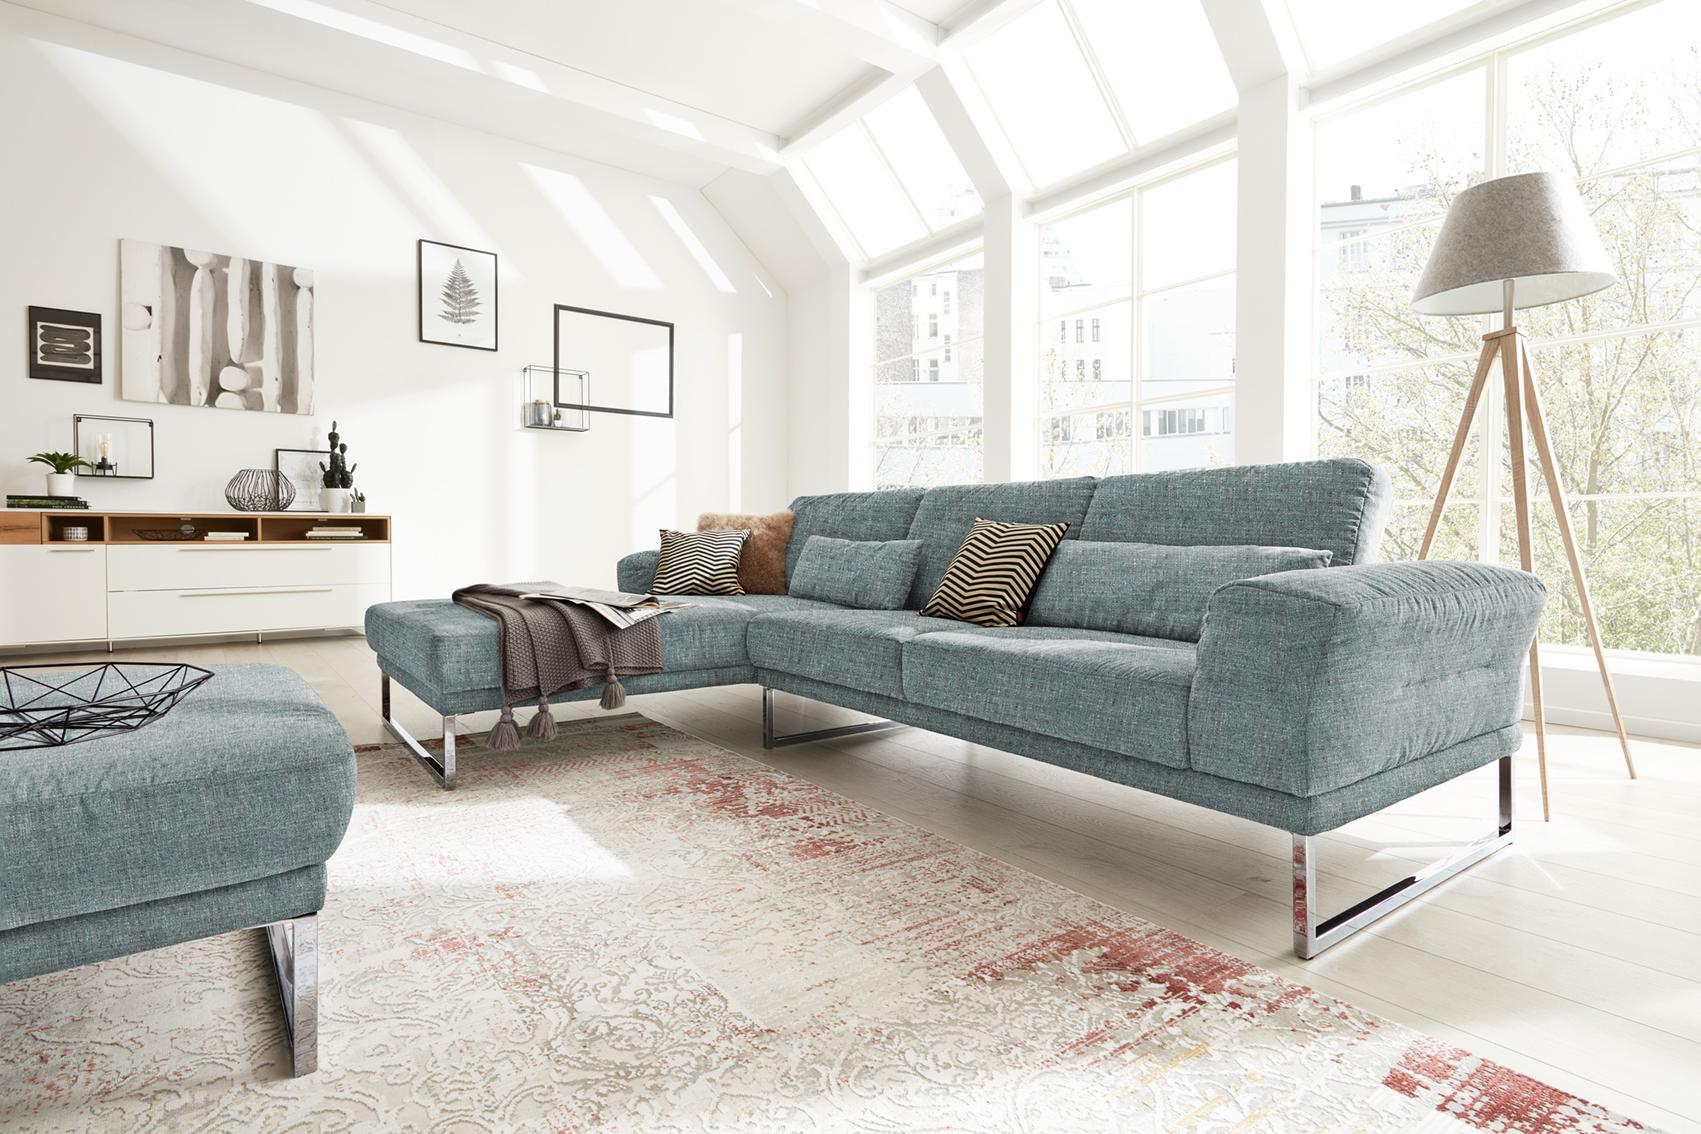 jobst-wohnwelt-Sofa-Serie-4102-Ecksofa-Prime_Blue_Grey